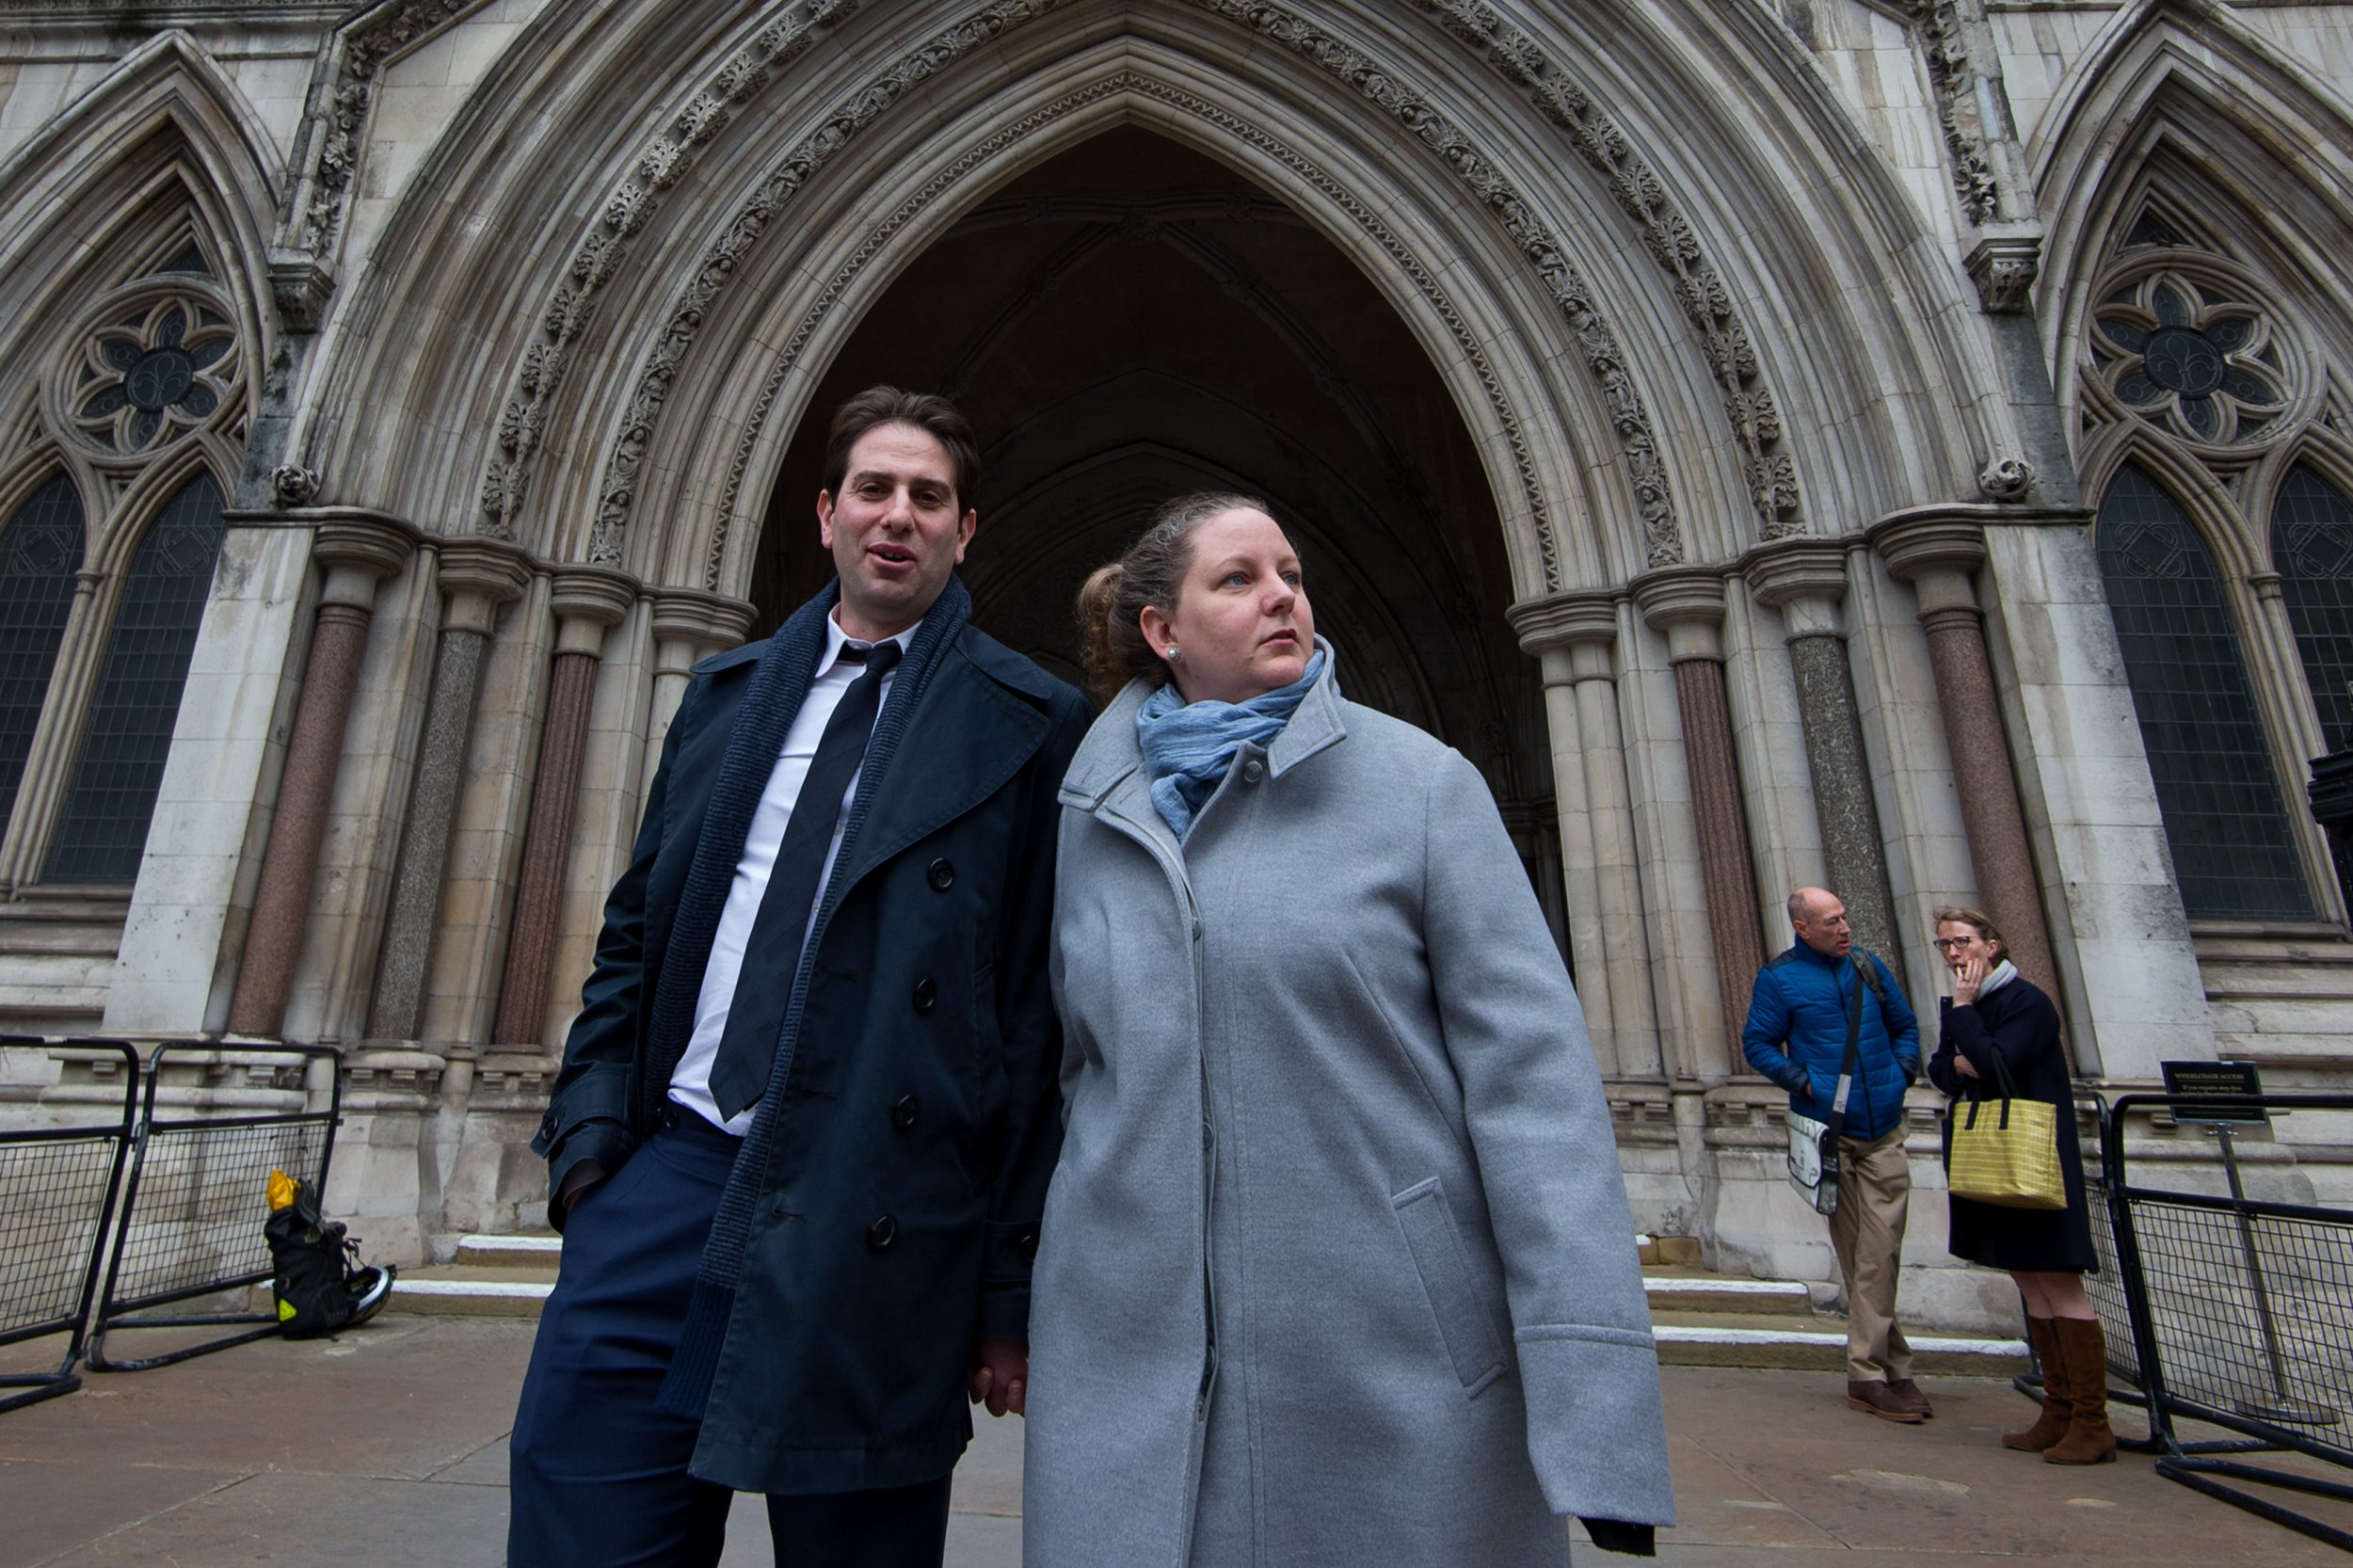 Heterosexual couple lose civil partnership